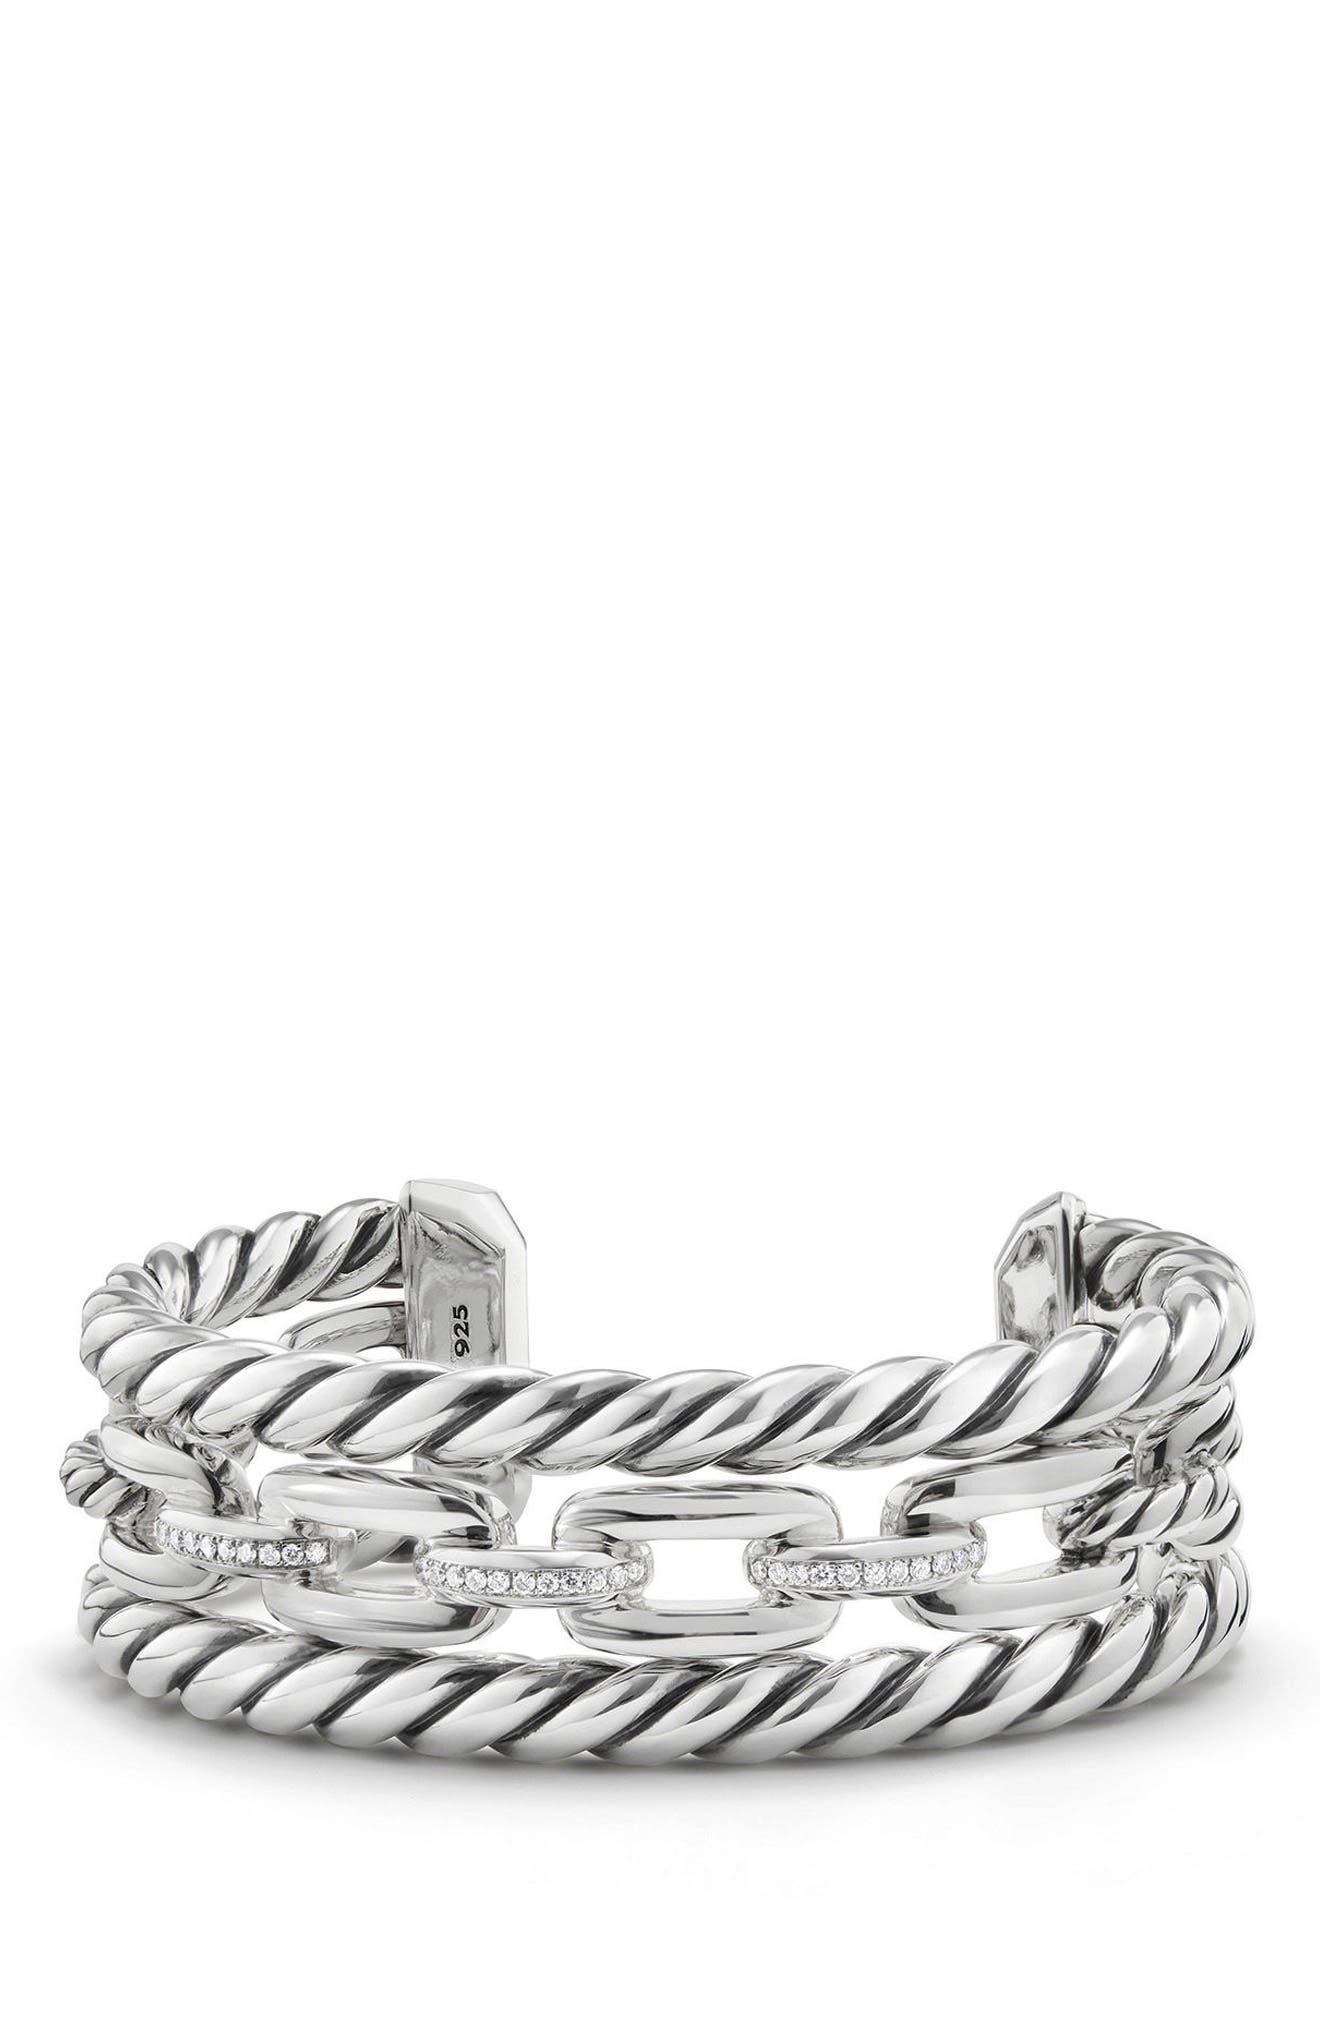 Main Image - David Yurman Wellesley Link Chain Three-Row Cuff with Diamonds